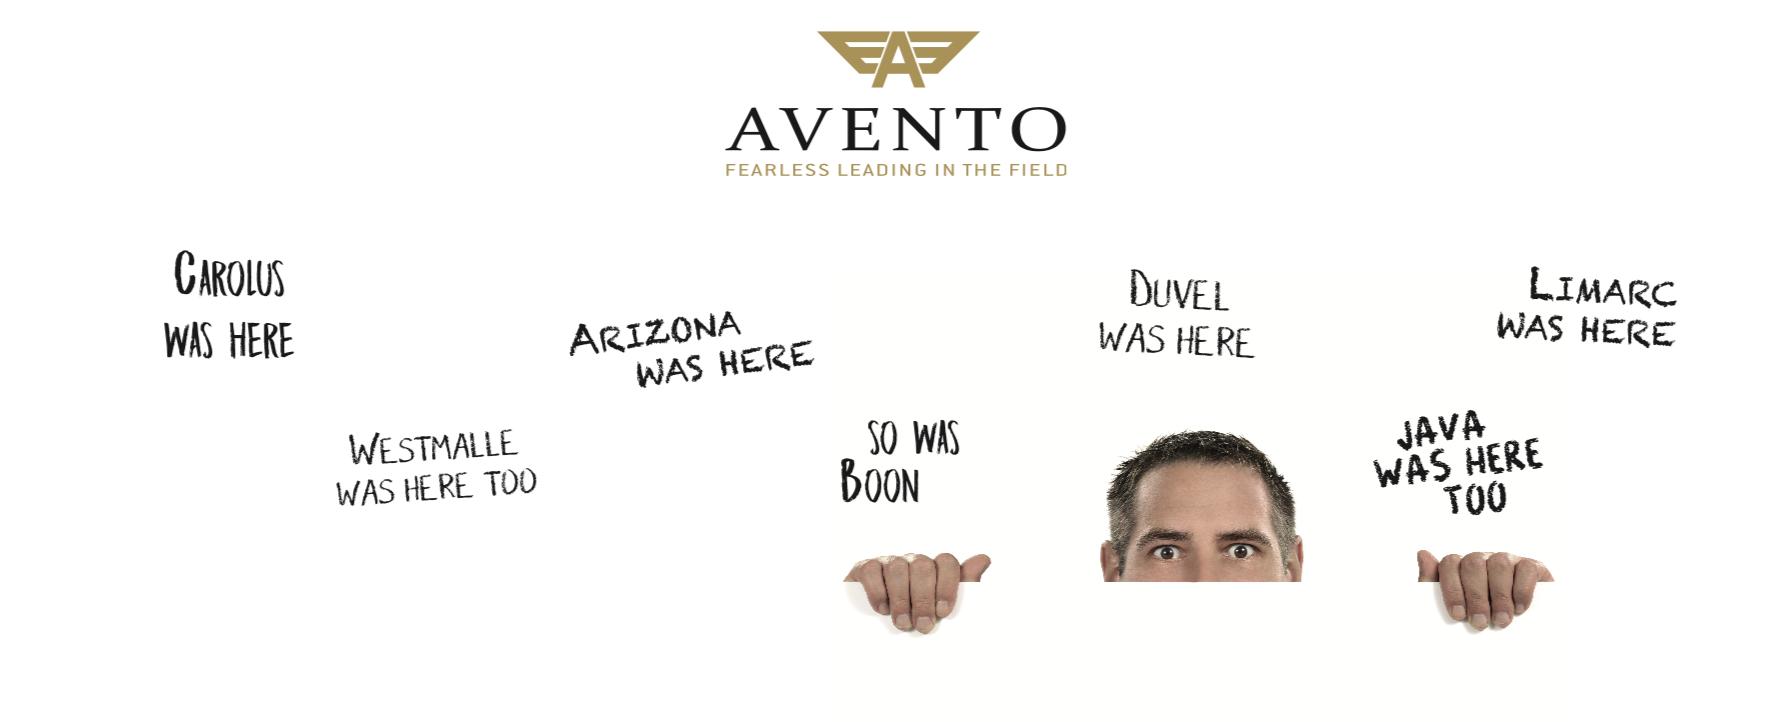 Avento is aanwezig op Horeca Expo (18 - 23 nov)